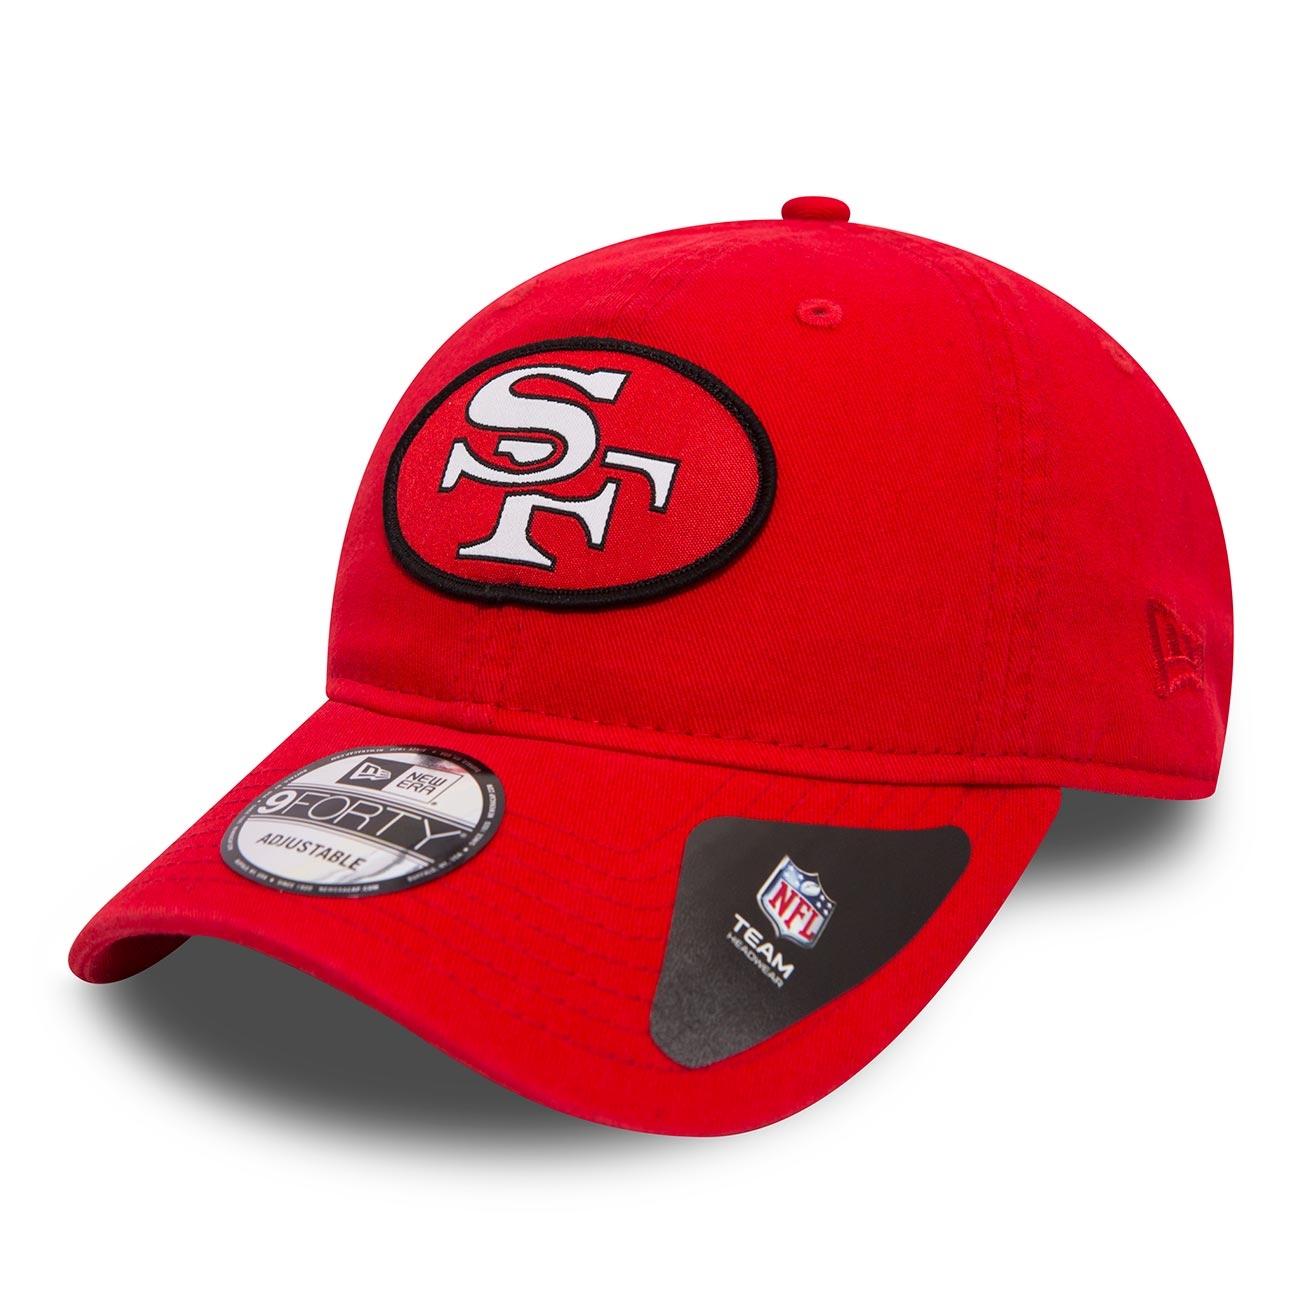 reputable site f5a4d 8c037 New Era San Francisco 49ers Classic Patch Adjustable NFL Cap Red   TAASS.com  Fan Shop